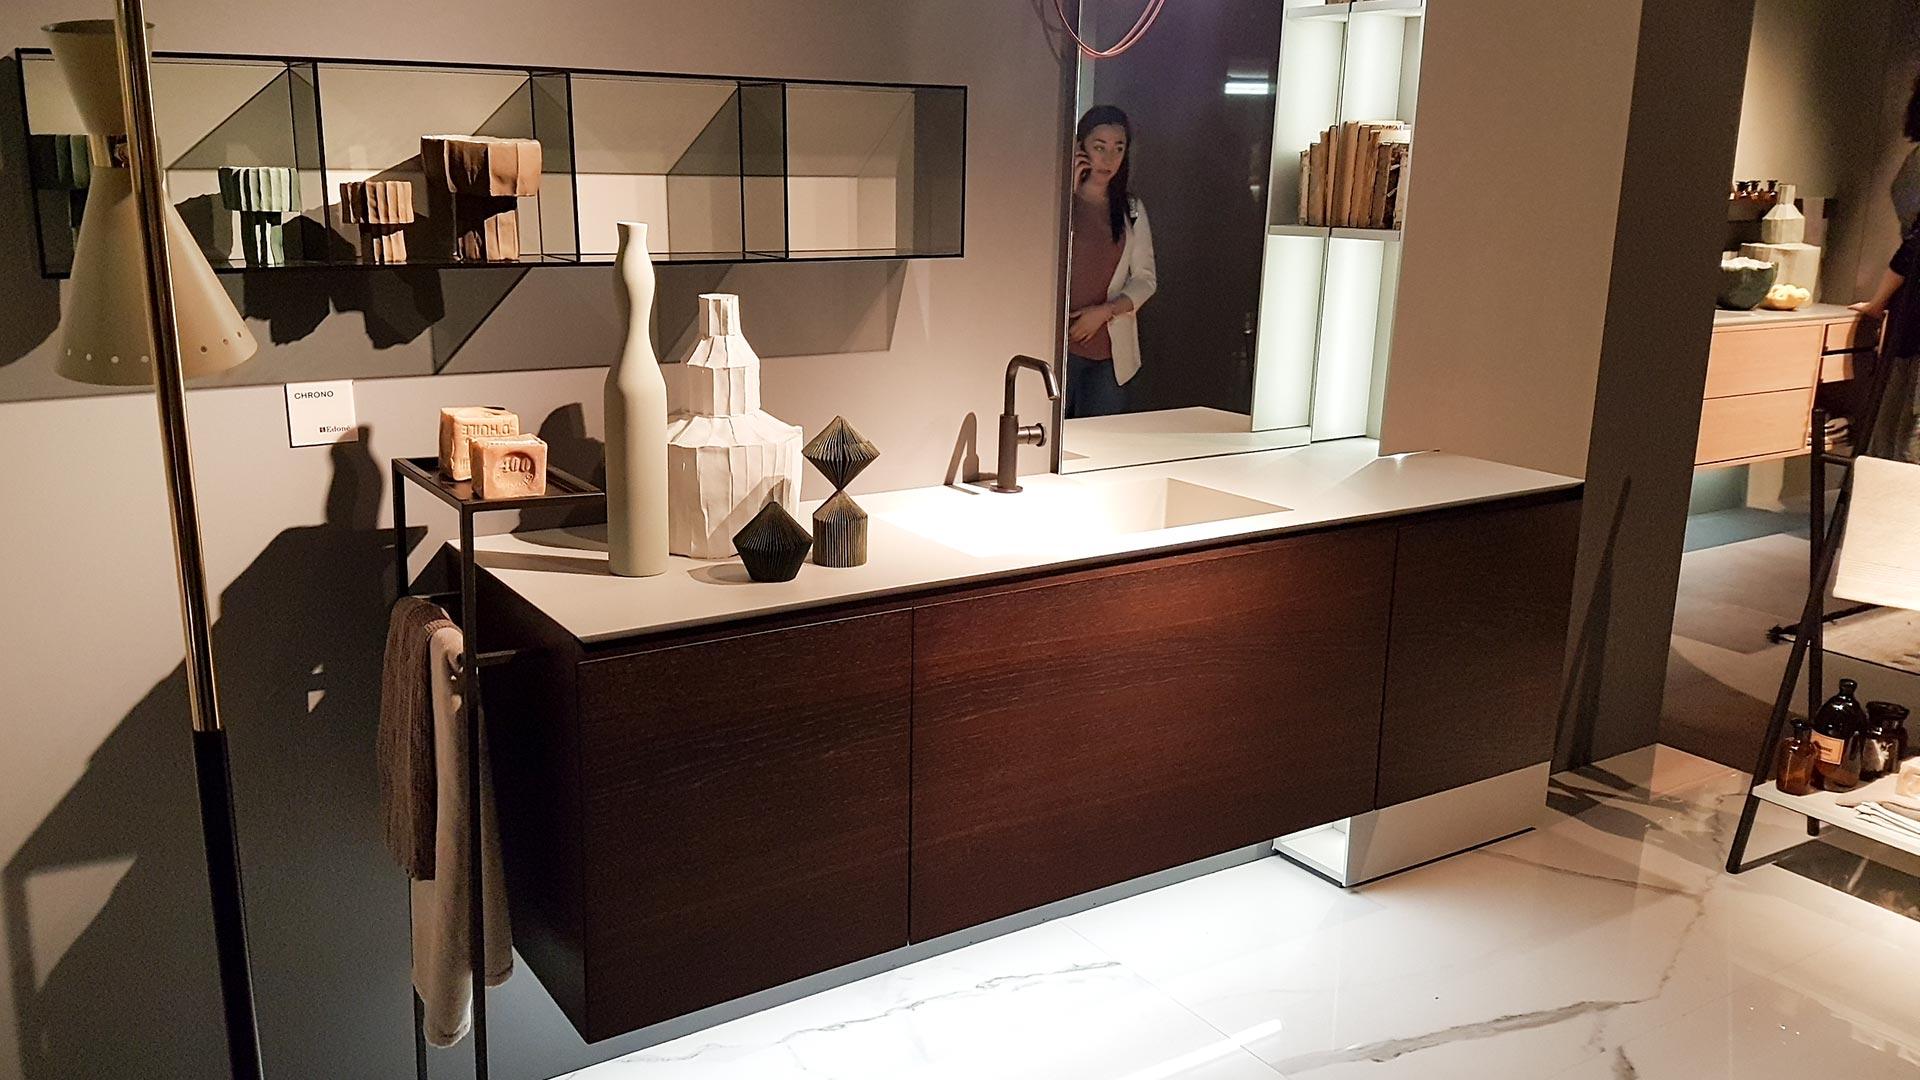 badezimmertrends von der m belmesse mailand 2018 teil 2 des messeberichts aktuelles hammer. Black Bedroom Furniture Sets. Home Design Ideas